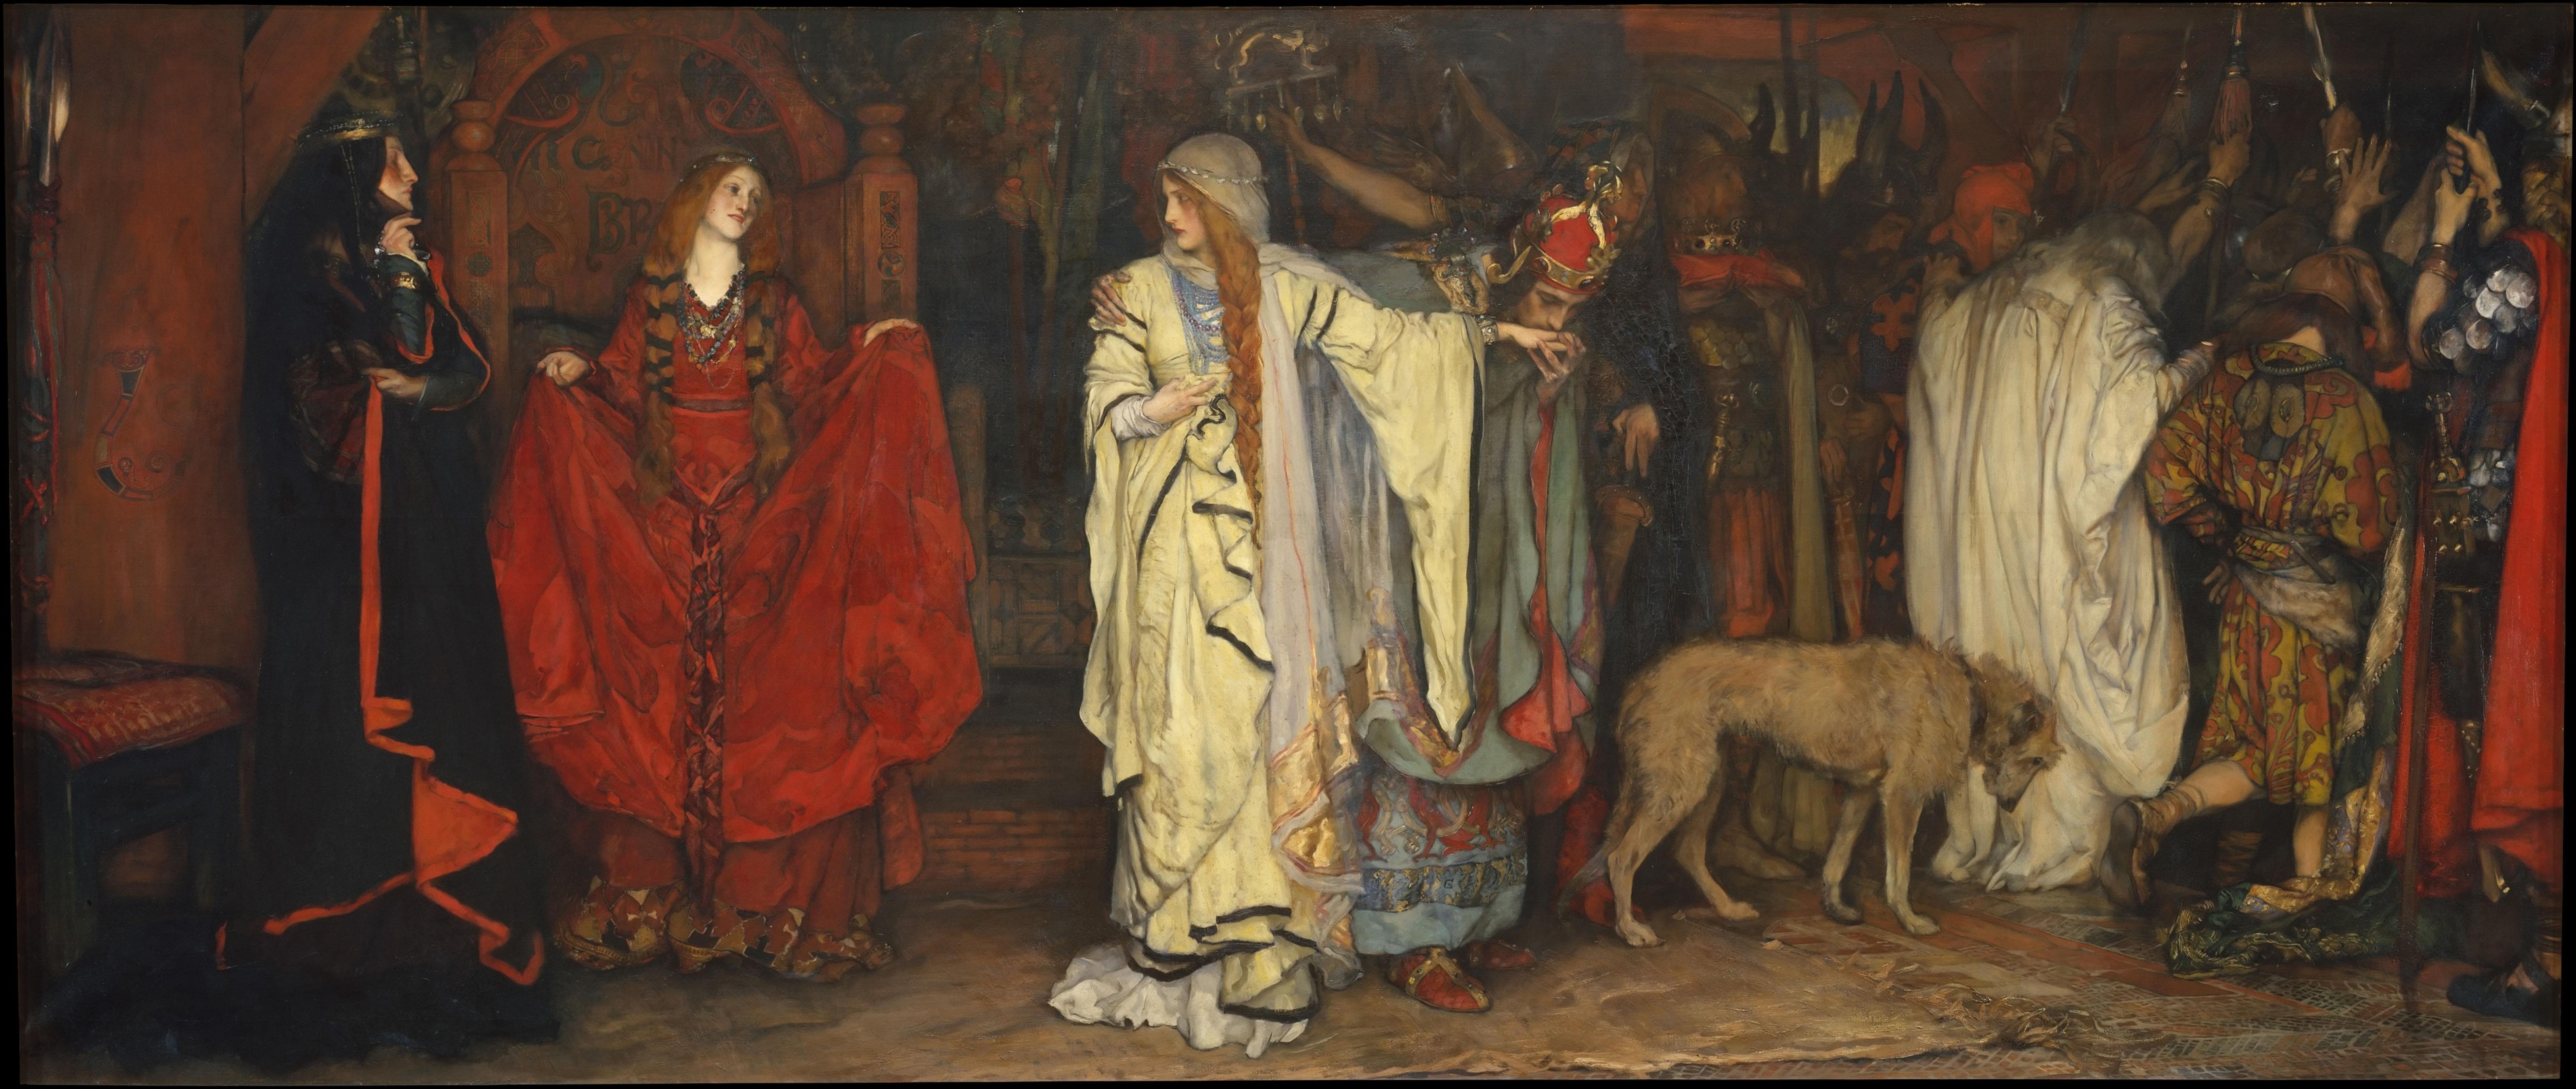 William Shakespeare Paintings